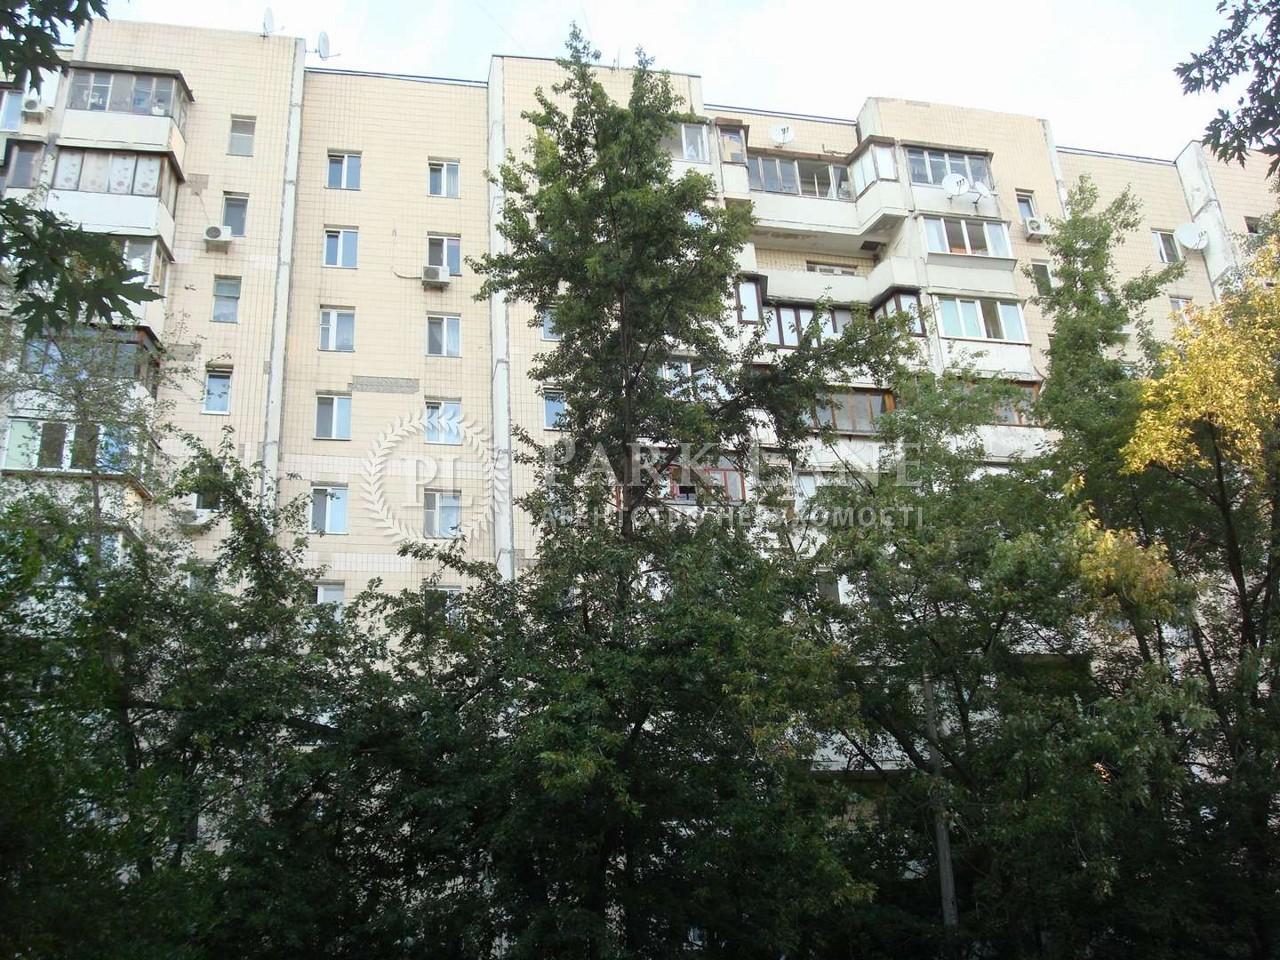 Квартира Z-1204242, Полярная, 6, Киев - Фото 4